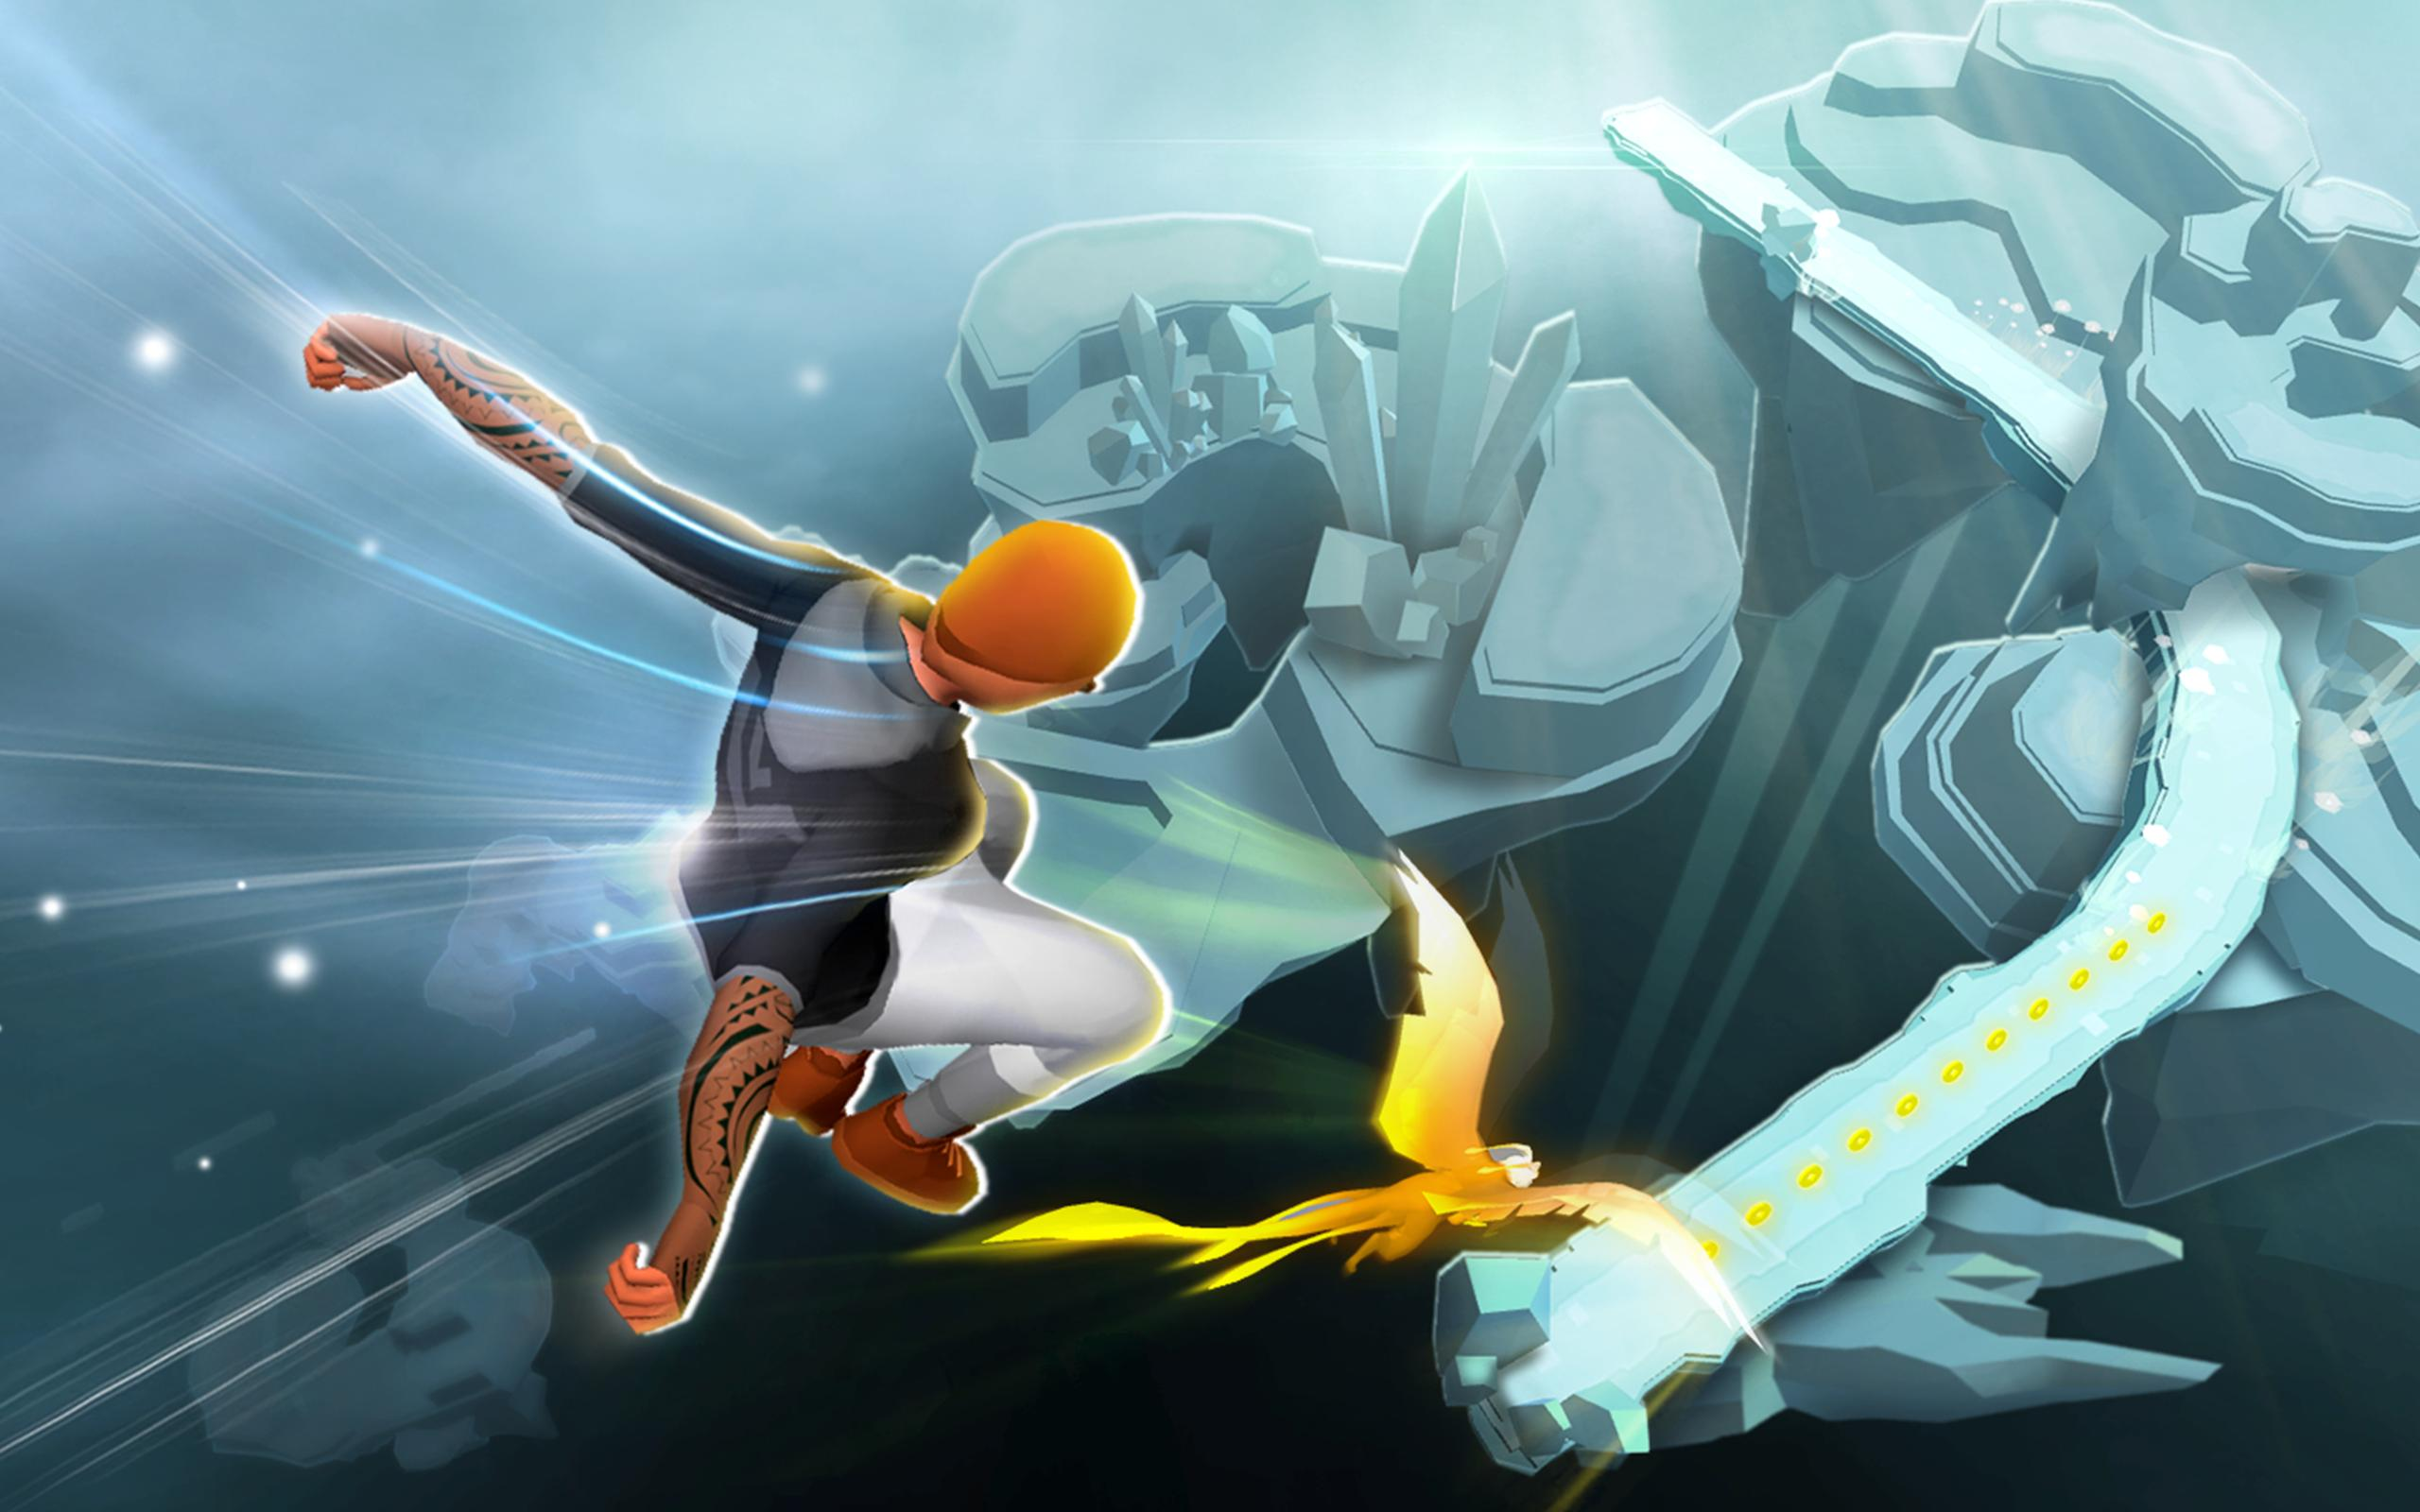 Sky Dancer Run - Running Game 4.2.0 Screenshot 16